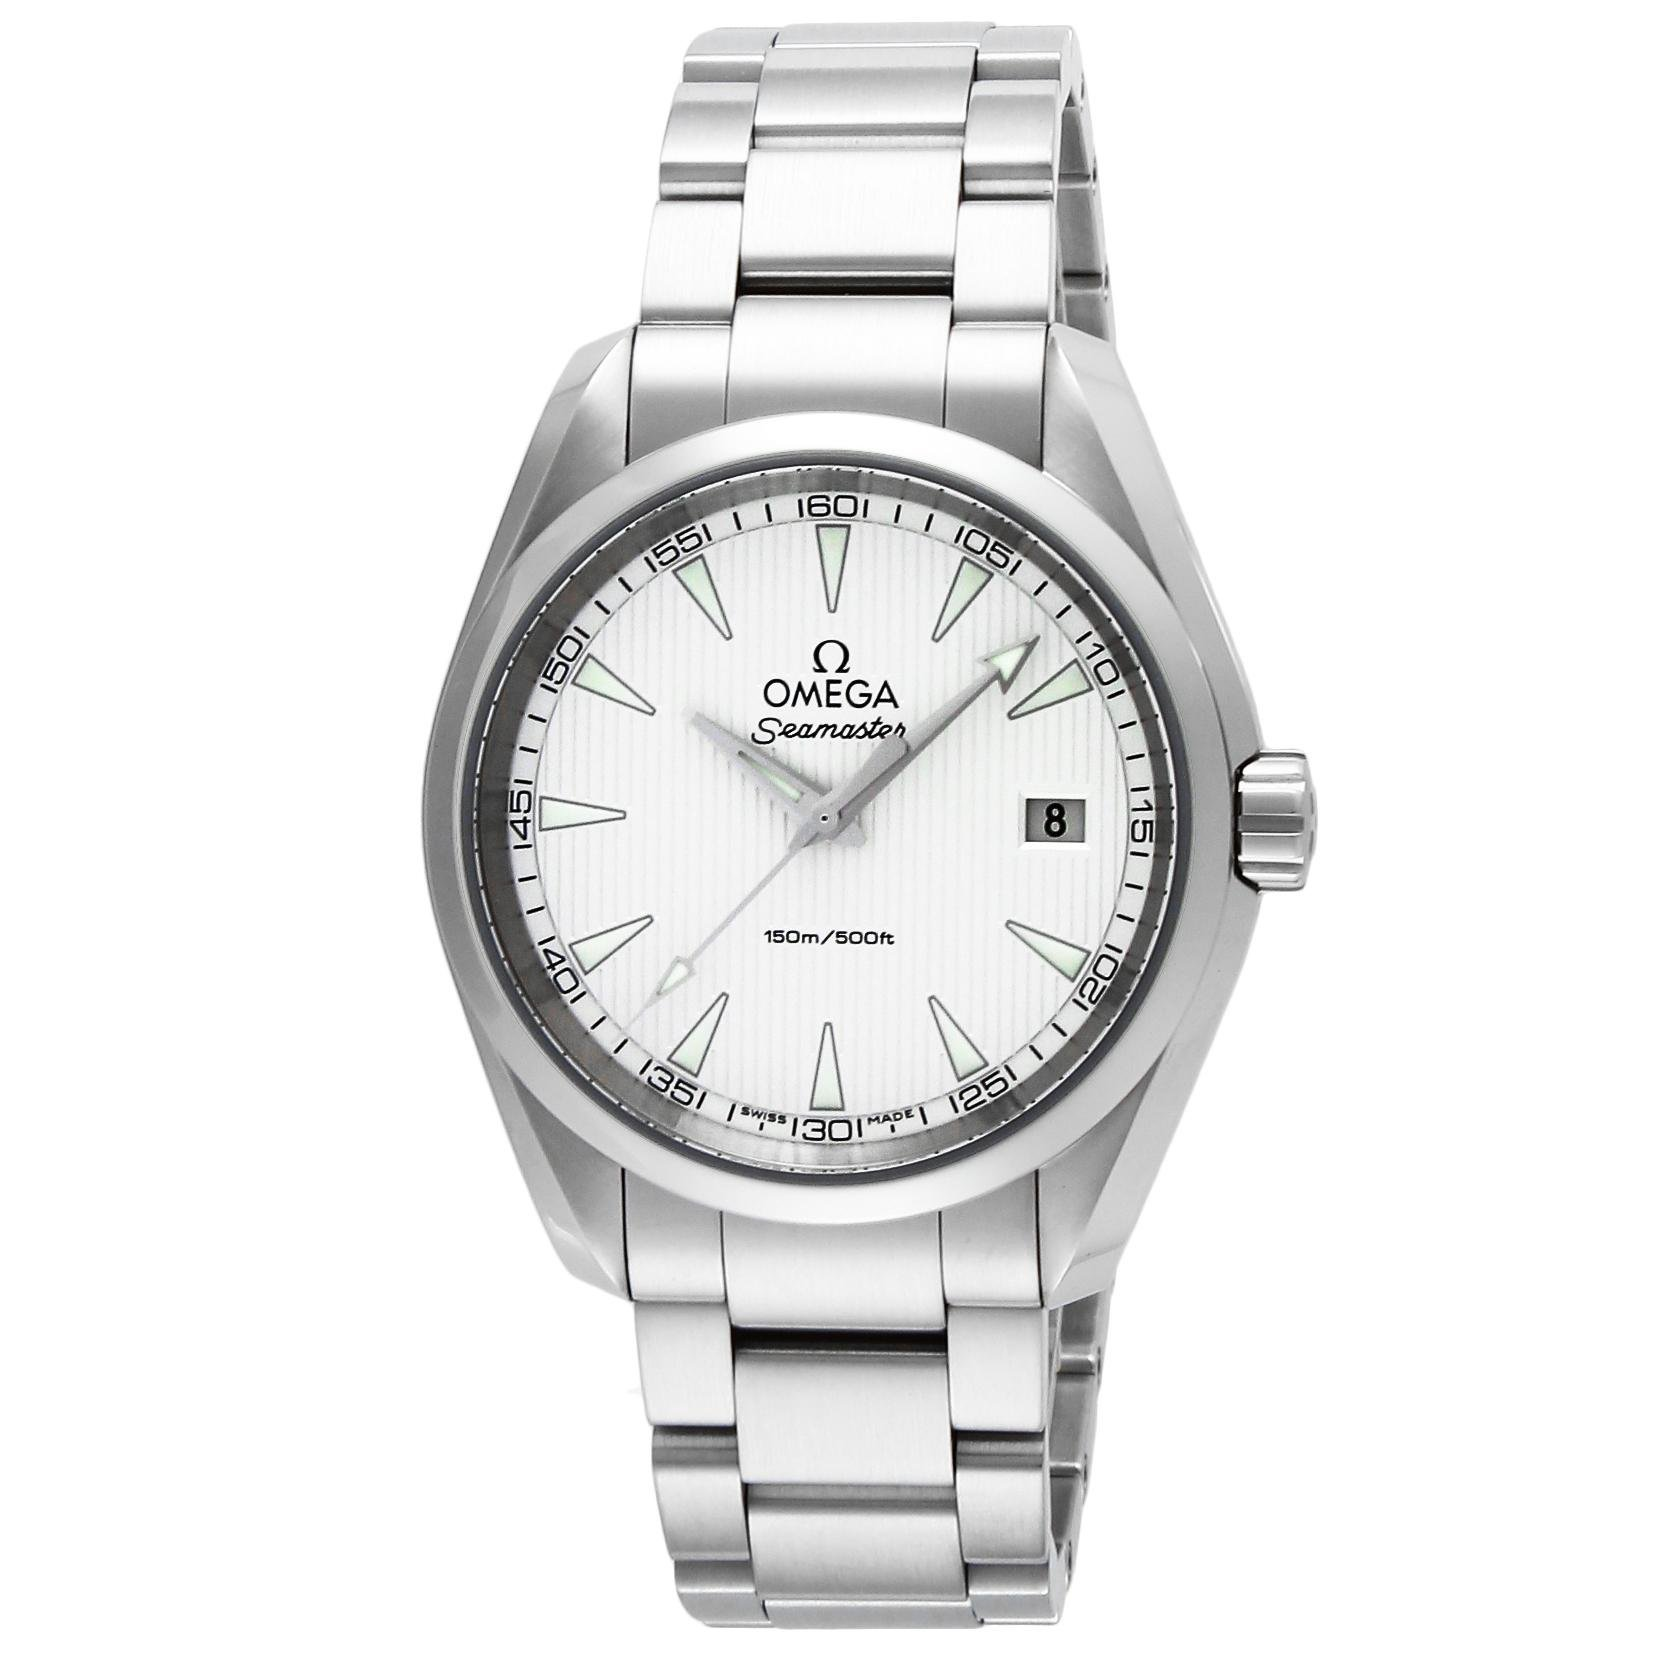 new product 101fc 9514b [オメガ] 腕時計 シーマスターアクアテラ シルバー文字盤 150M防水 231.10.39.60.02.001 並行輸入品 シルバー